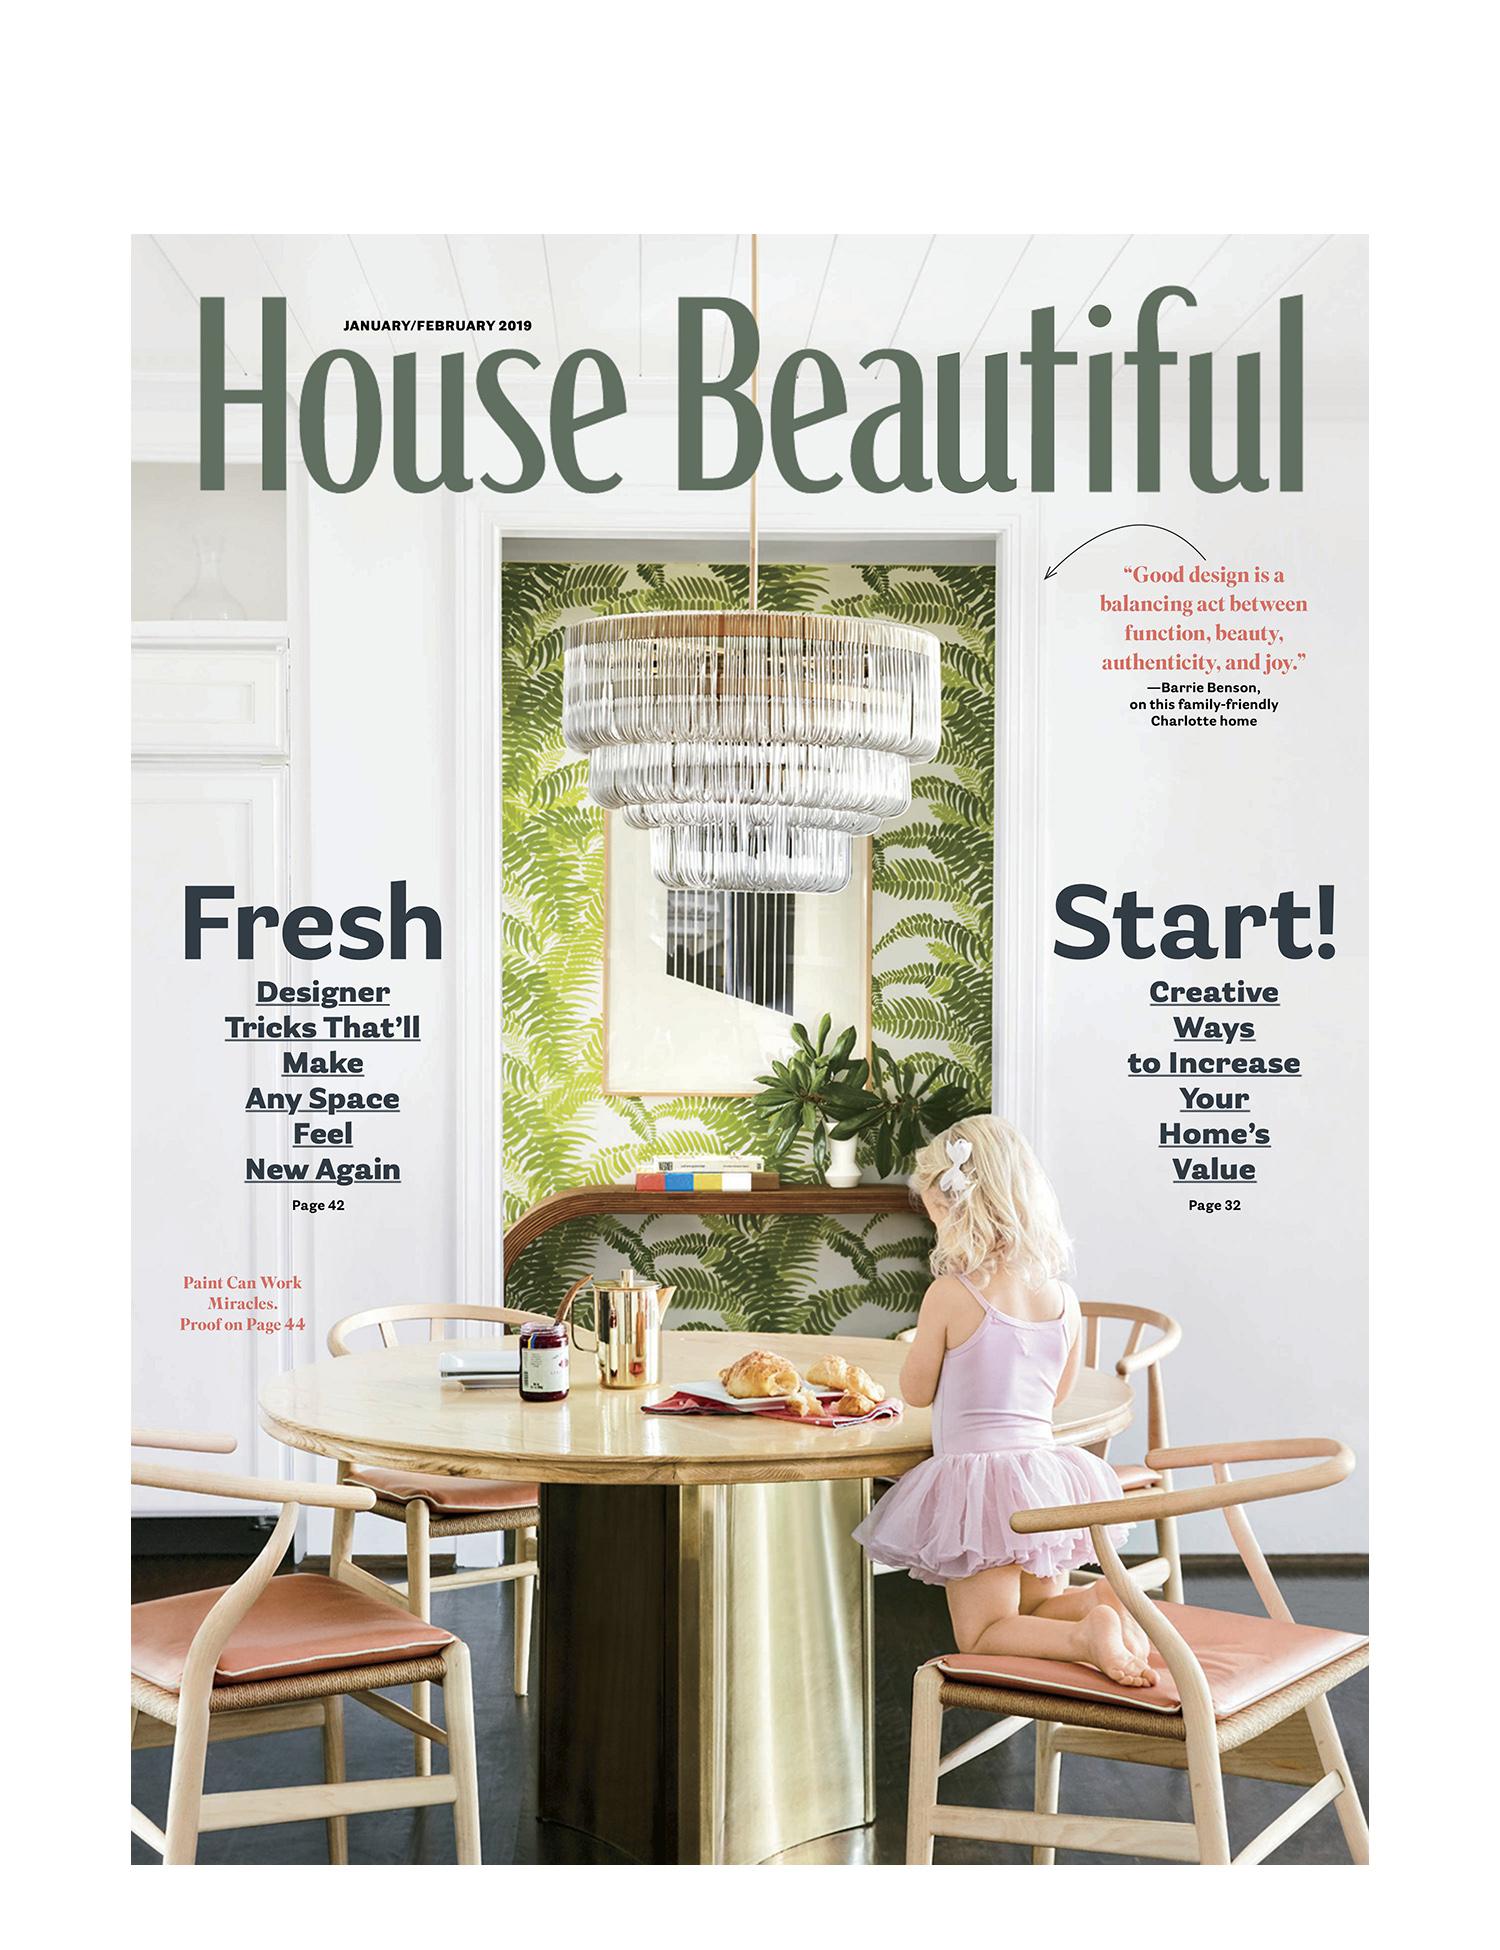 House Beautiful Jan/Feb 2019 Design: Barrie Benson